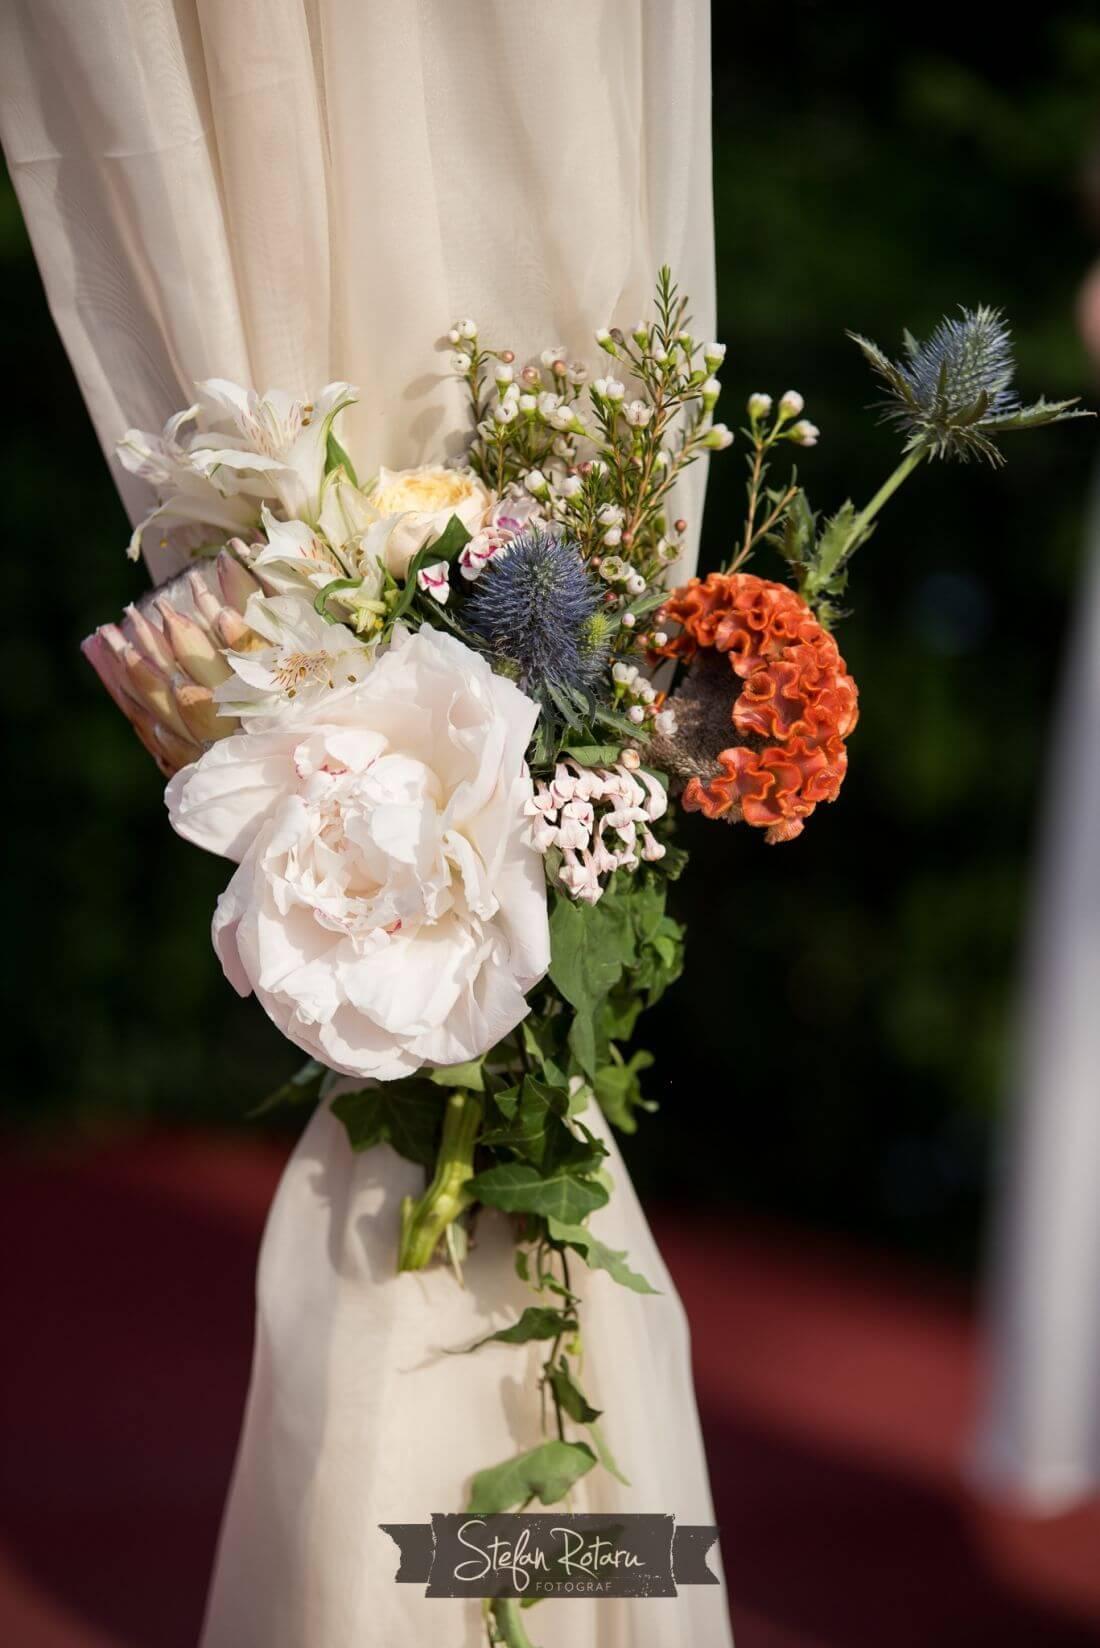 Petrecere ca-n Vama Veche - Alina si Cristi-IDO-Weddings-nuntiinaerliber (14)